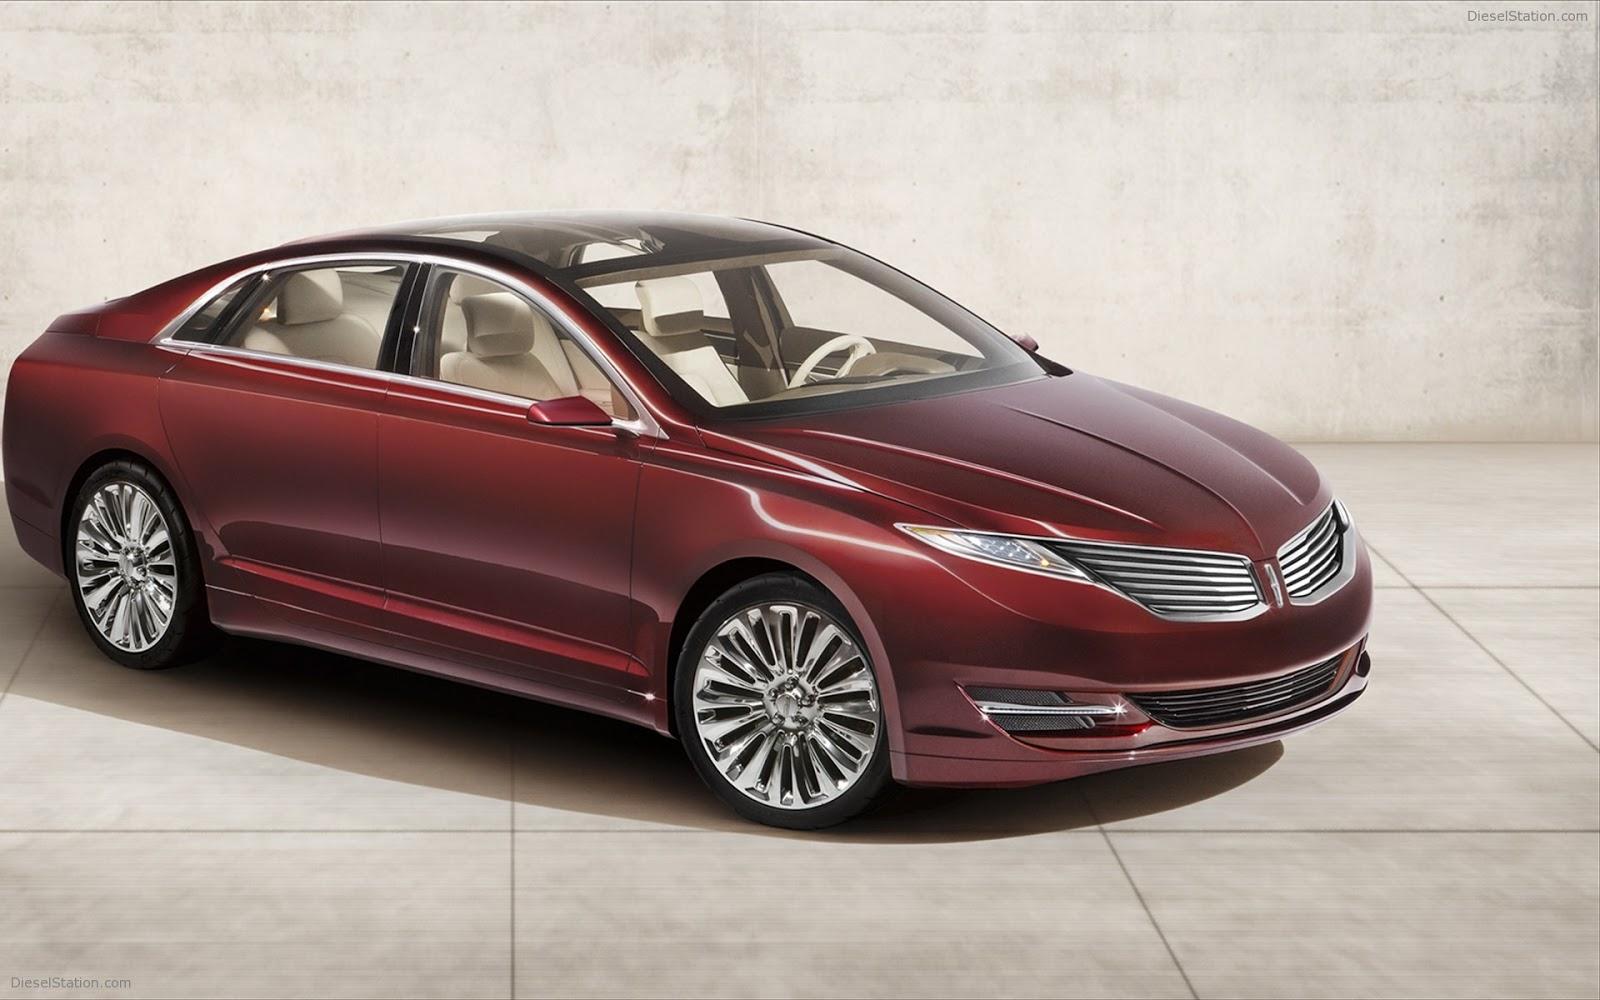 https://3.bp.blogspot.com/-eeV3FOCRSdE/UMxoCHQo_6I/AAAAAAAAFyM/wn1Nw8T2AkQ/s1600/2012+Lincoln+MKZ+Concept+1.jpg